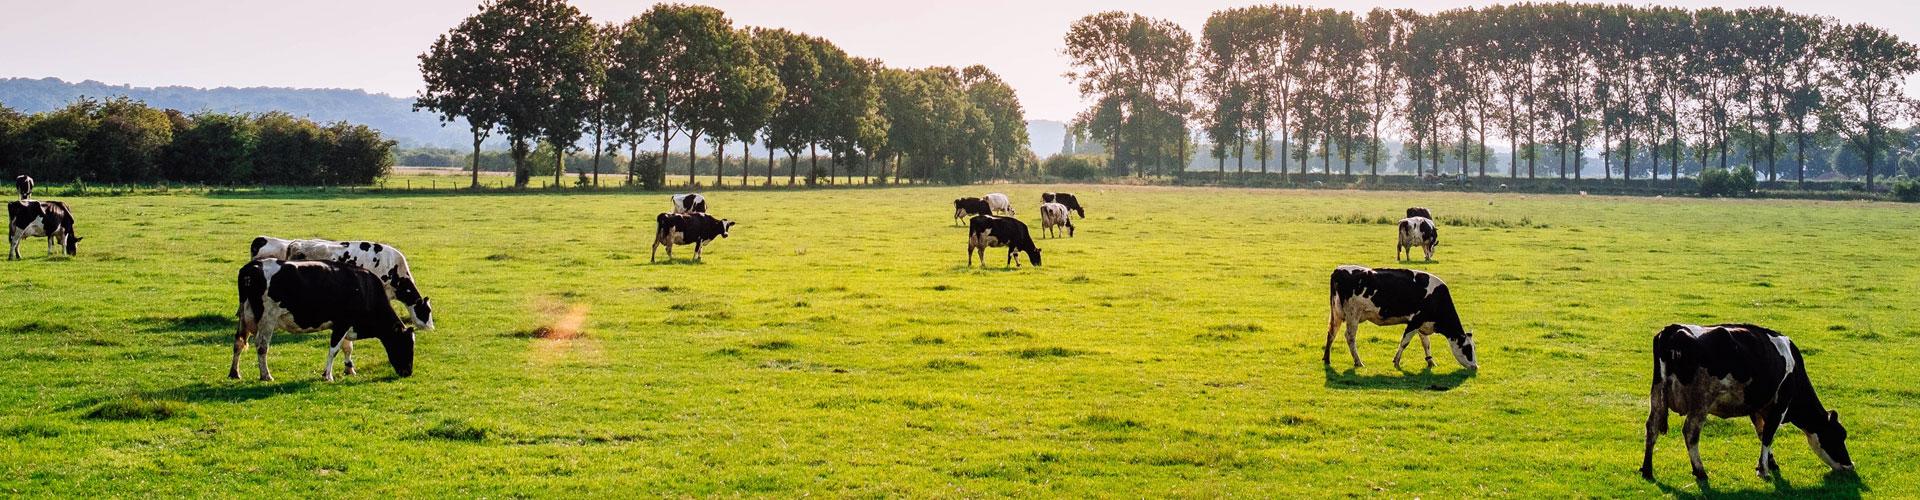 Slider pastos vacas